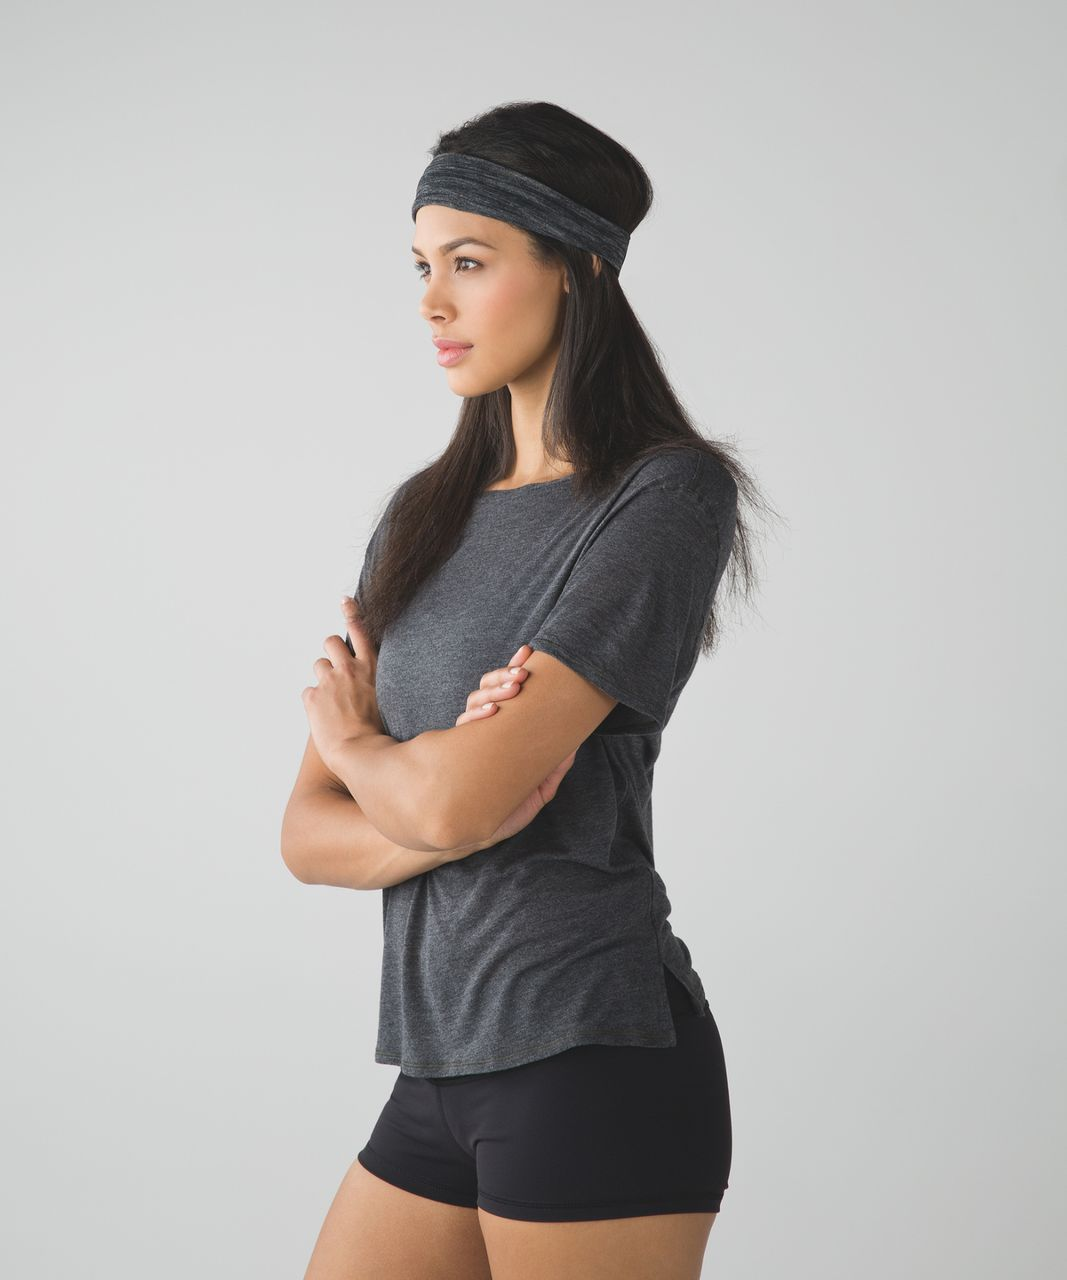 Lululemon Fringe Fighter Headband - Black / Heathered Black (First Release)